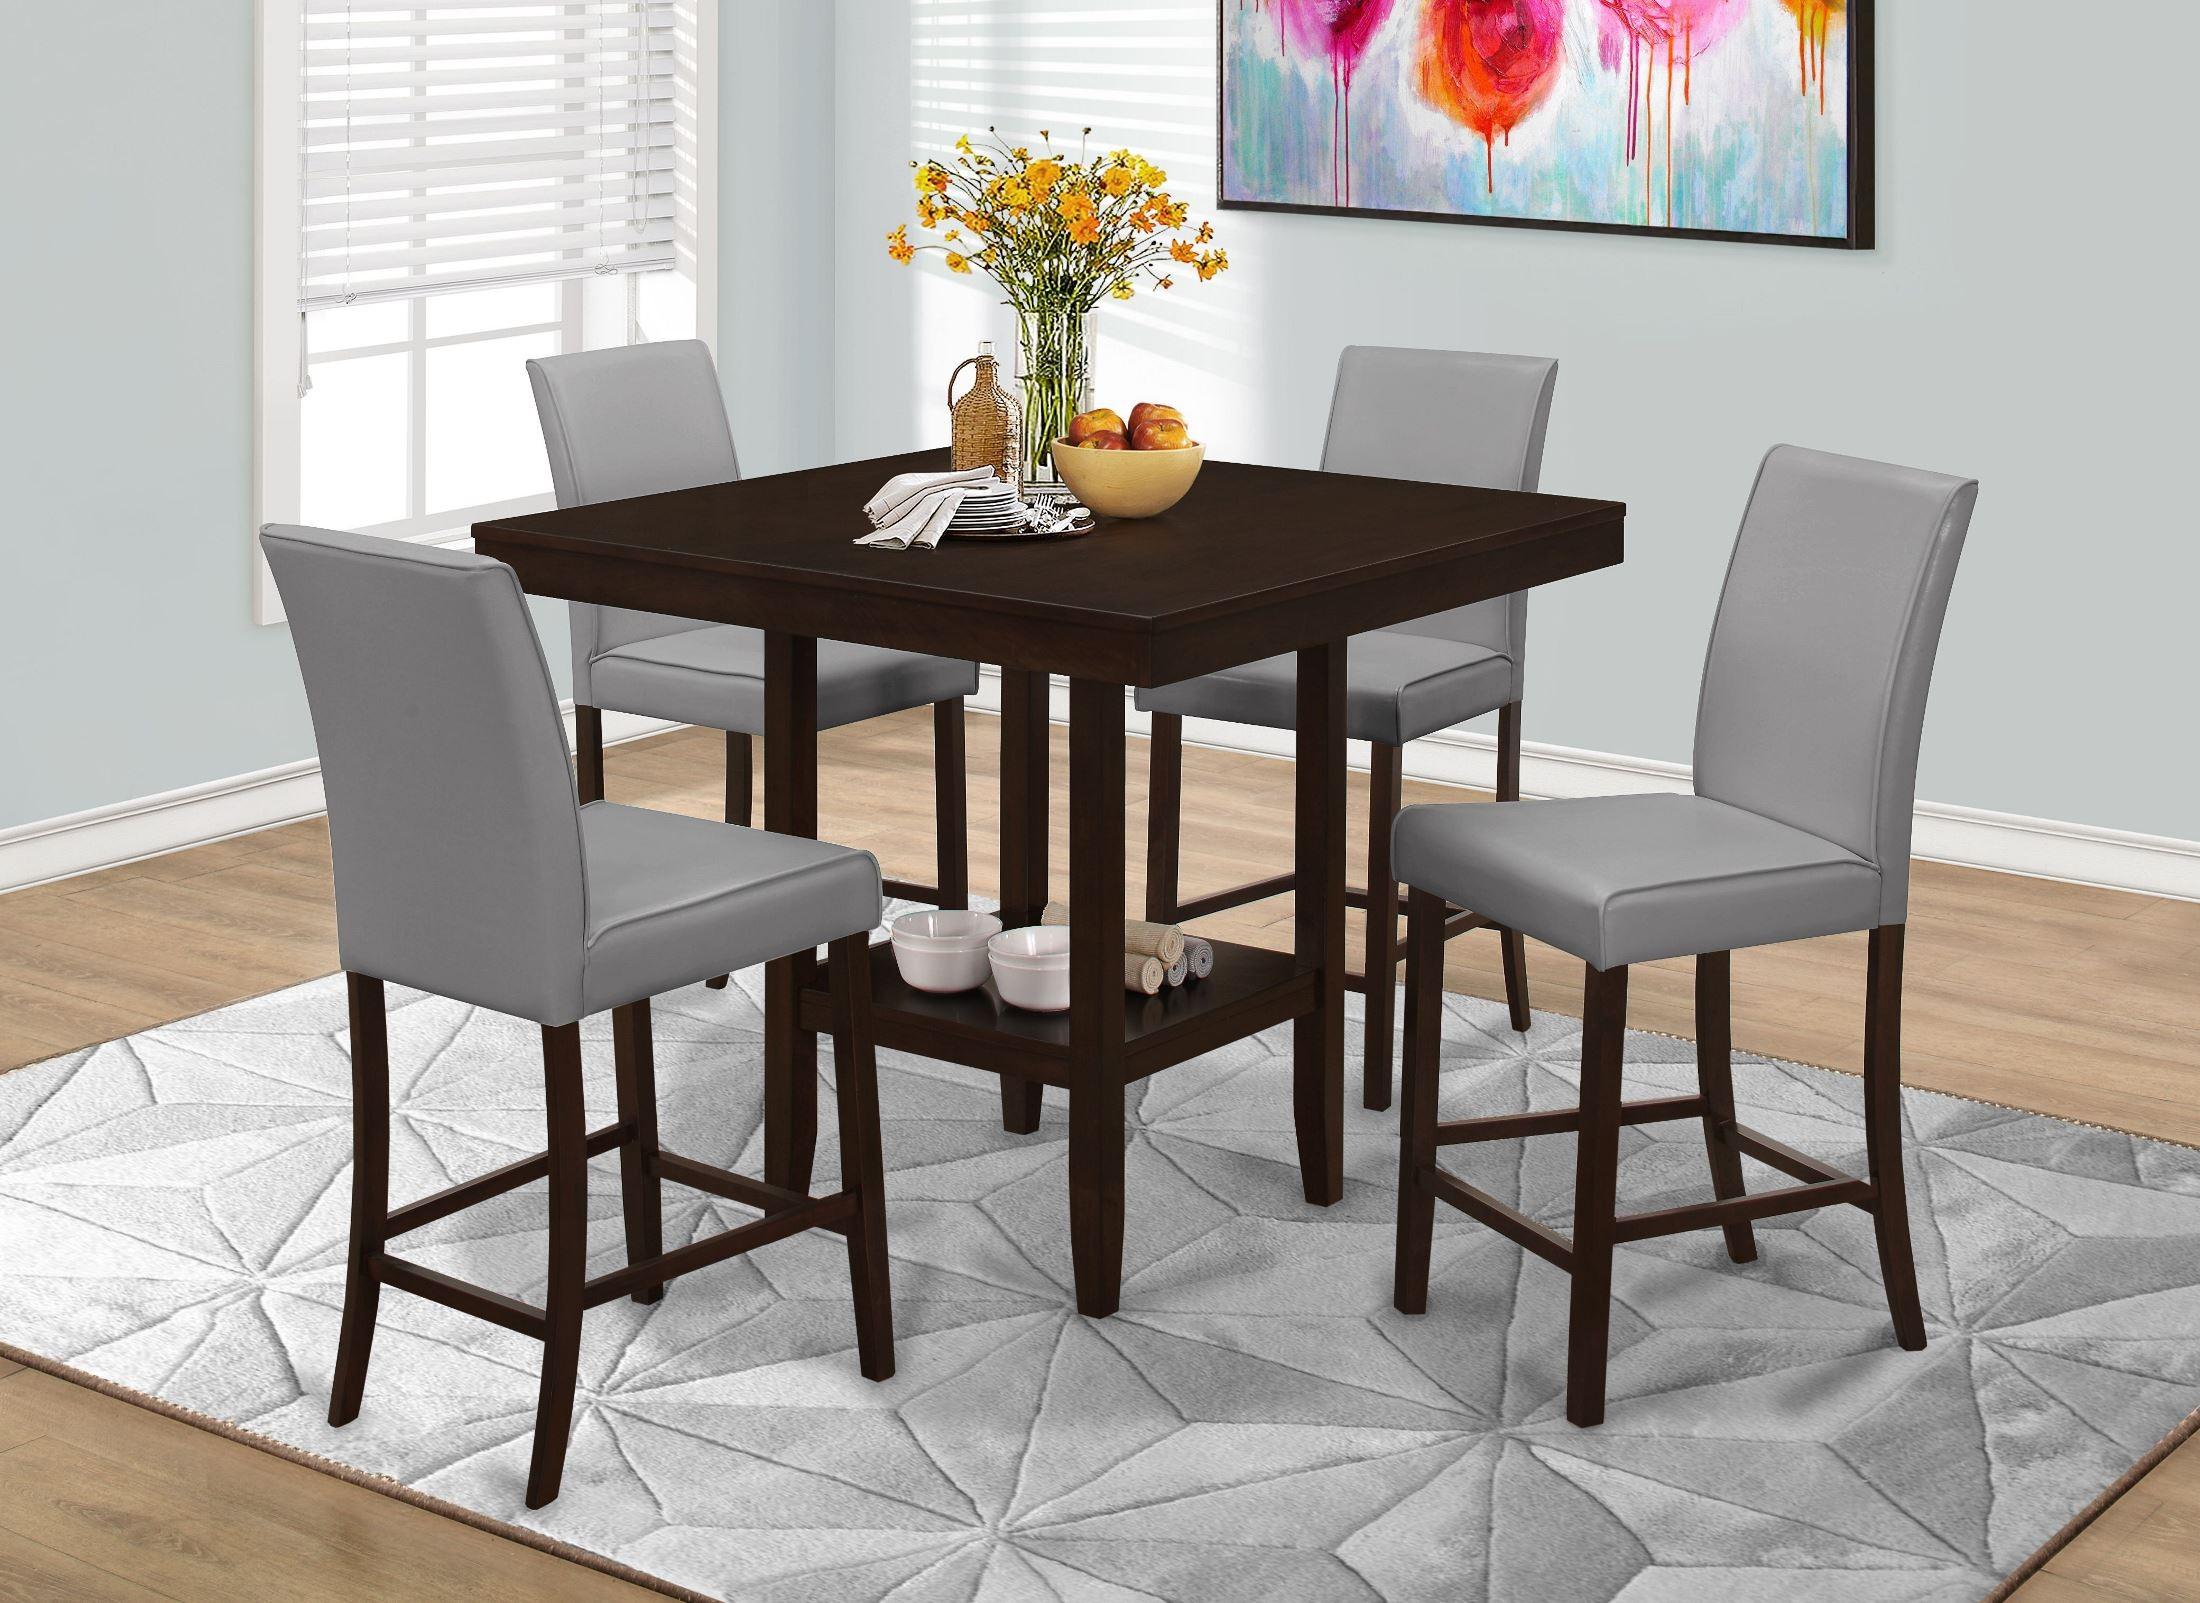 Designer Chairs  MADEcom